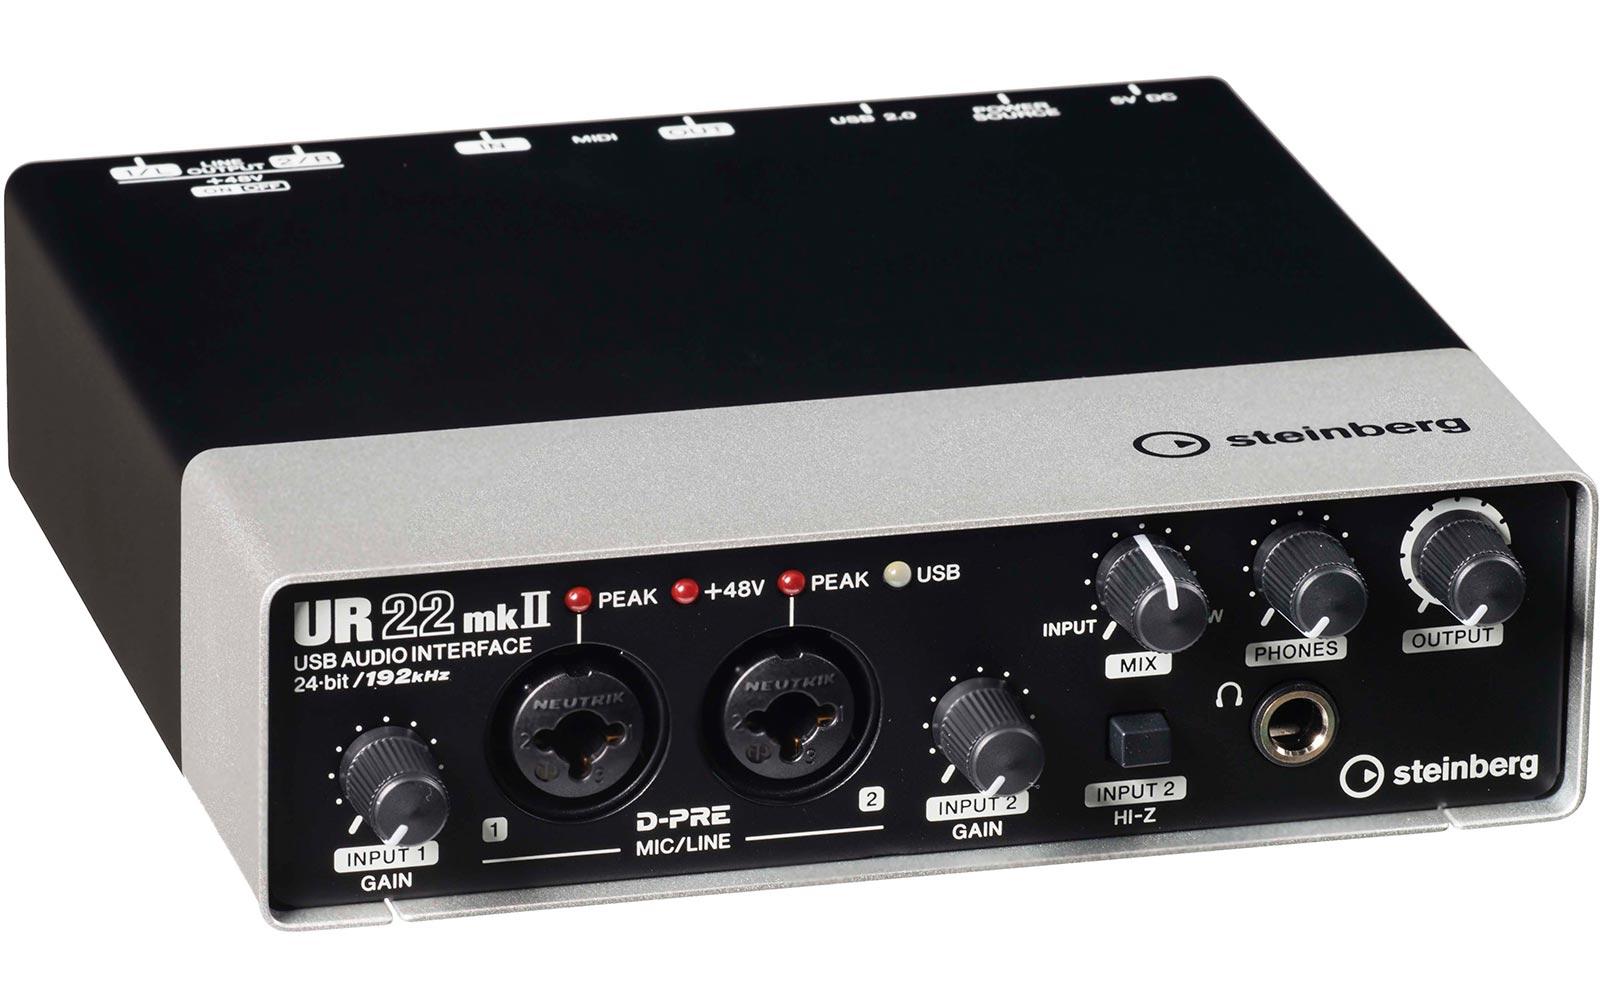 steinberg-ur22-mkii-usb-audio-interface-incl-midi-i-o